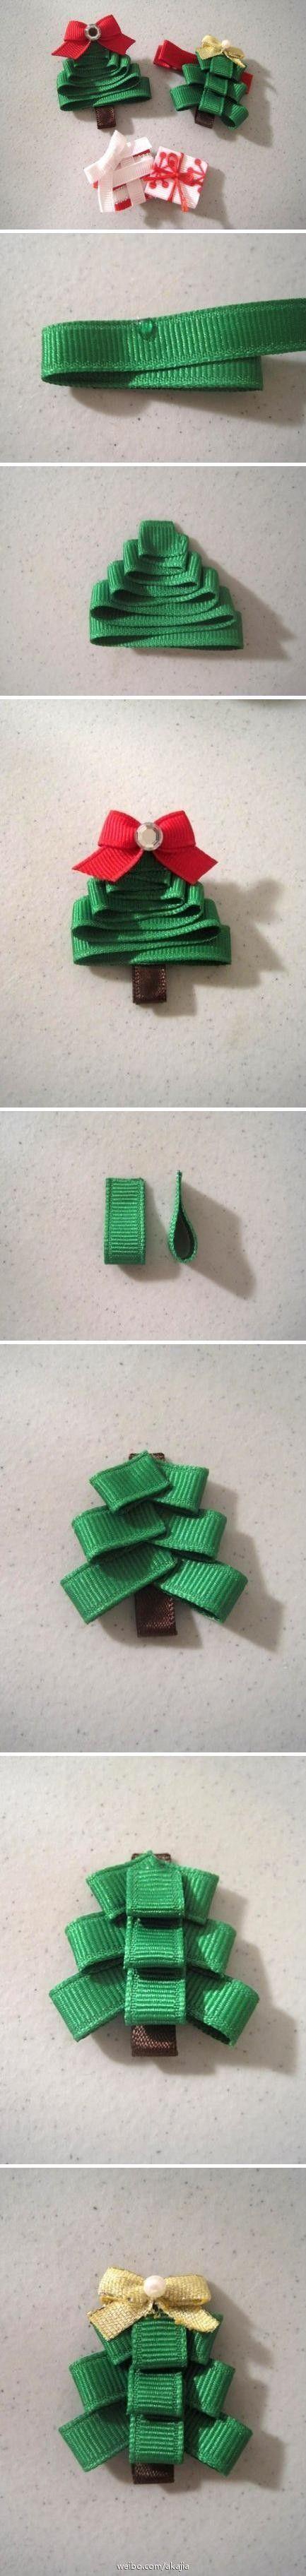 Ribbon hair clip - Christmas tree